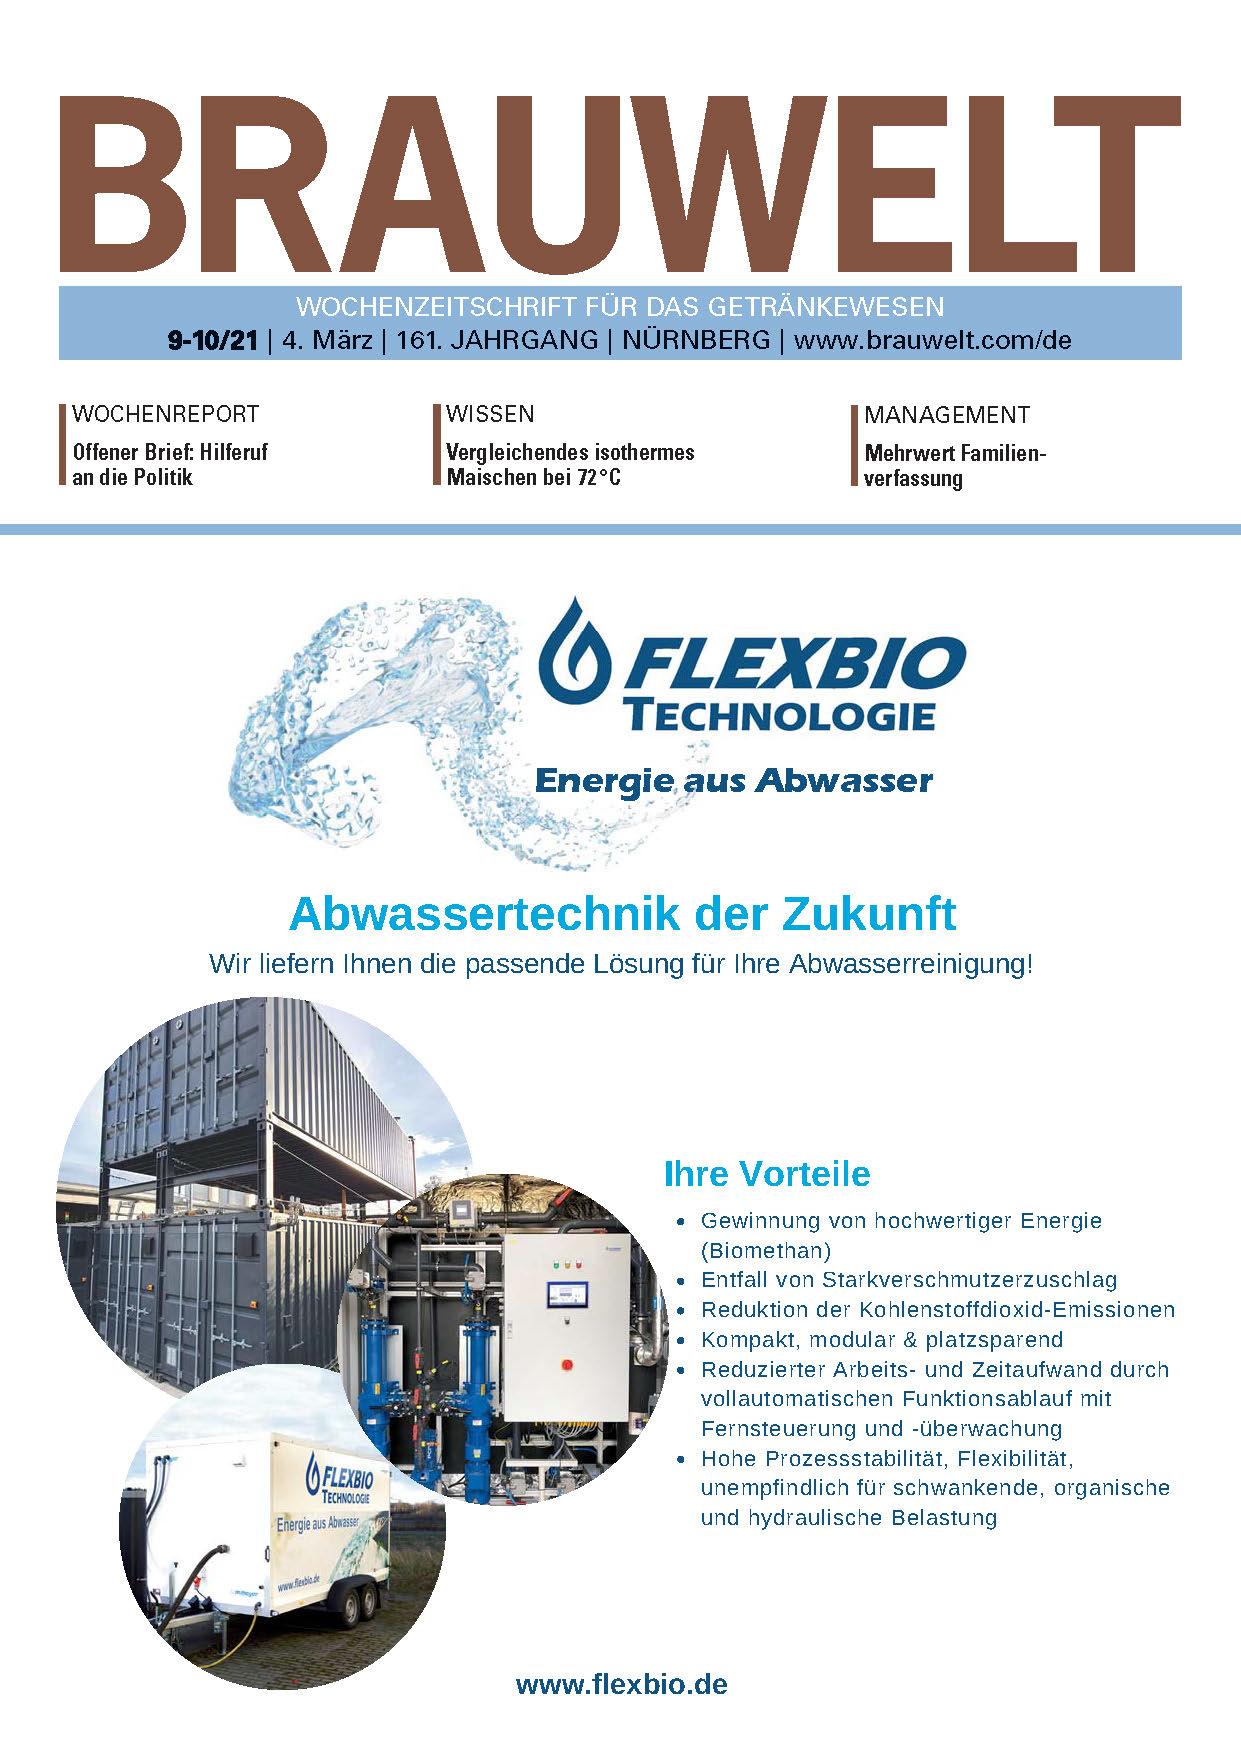 BRAUWELT front page FlexBio technology